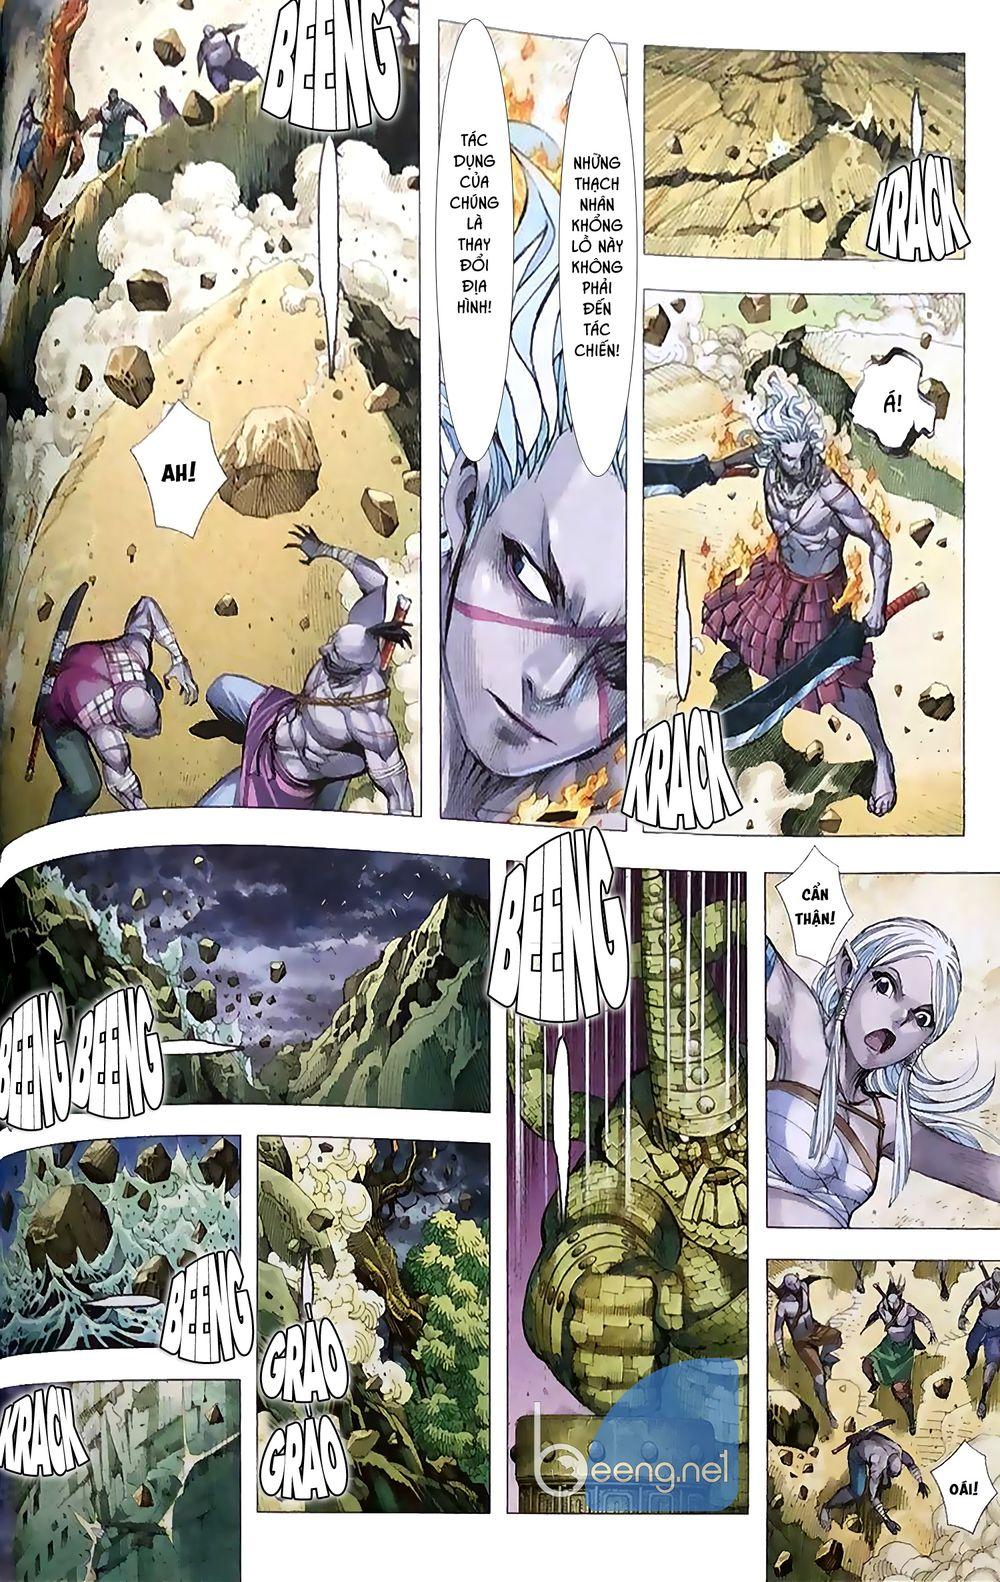 A Tu La - Tây Du Ngoại Truyện Chapter 11 - Trang 4